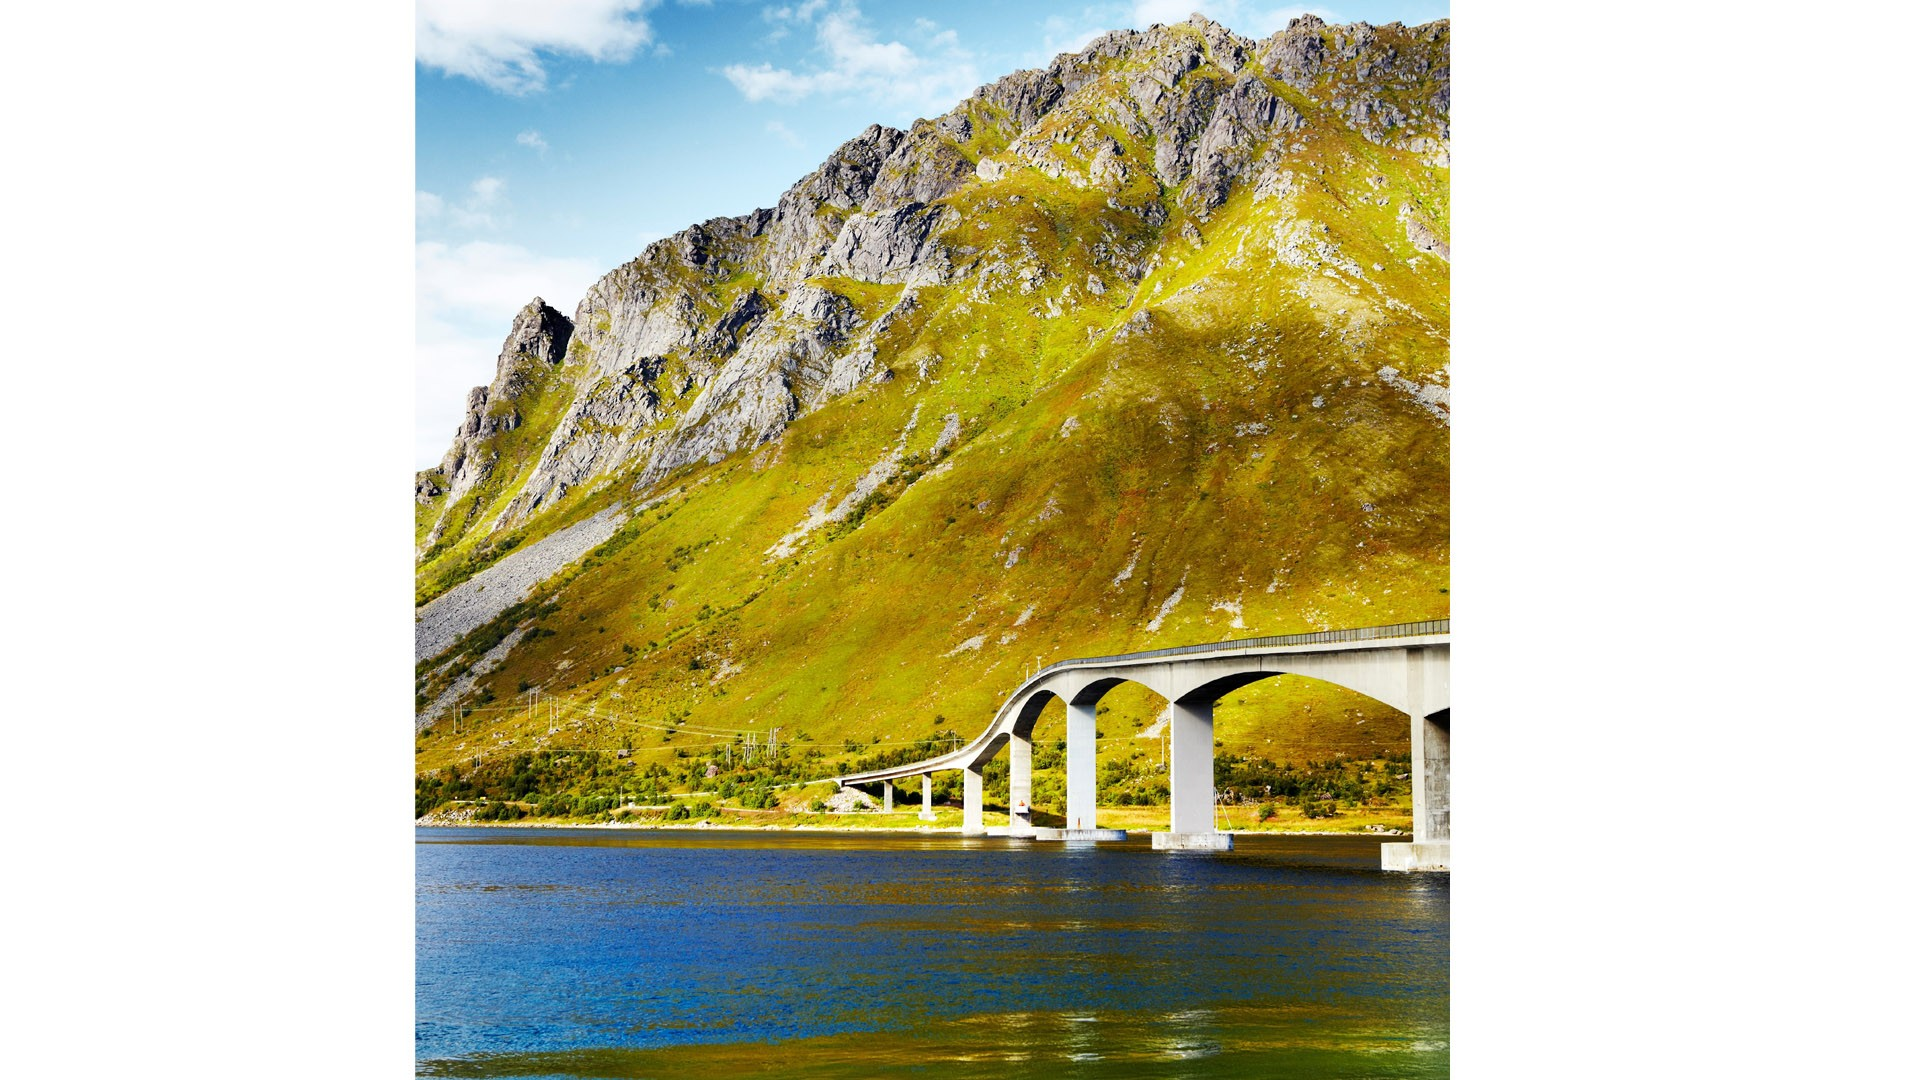 Gimsøystraumen Bridge links Austvagoy with Gimsøy in the Lofoten Islands, Norway